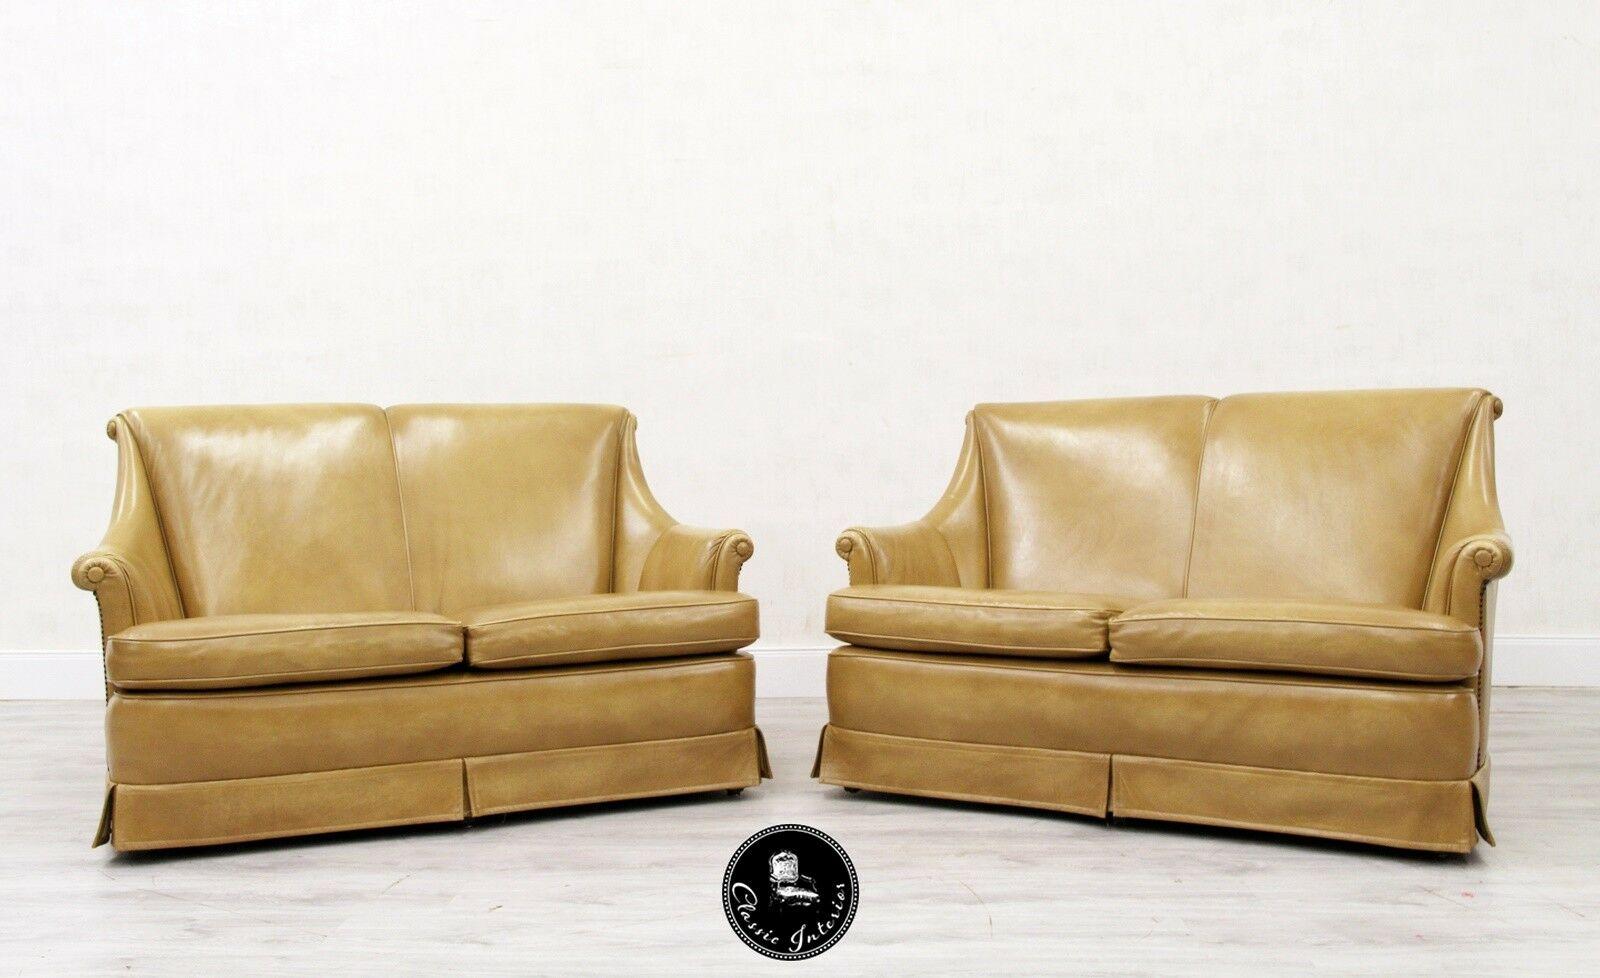 Full Size of Chesterfield Ohrensessel Fernsehsessel Sessel Stuhle Antik Sofa Landhaus Federkern Online Kaufen Ektorp Wildleder Langes Big Poco Mit Relaxfunktion 3 Sitzer Sofa Sofa Englisch